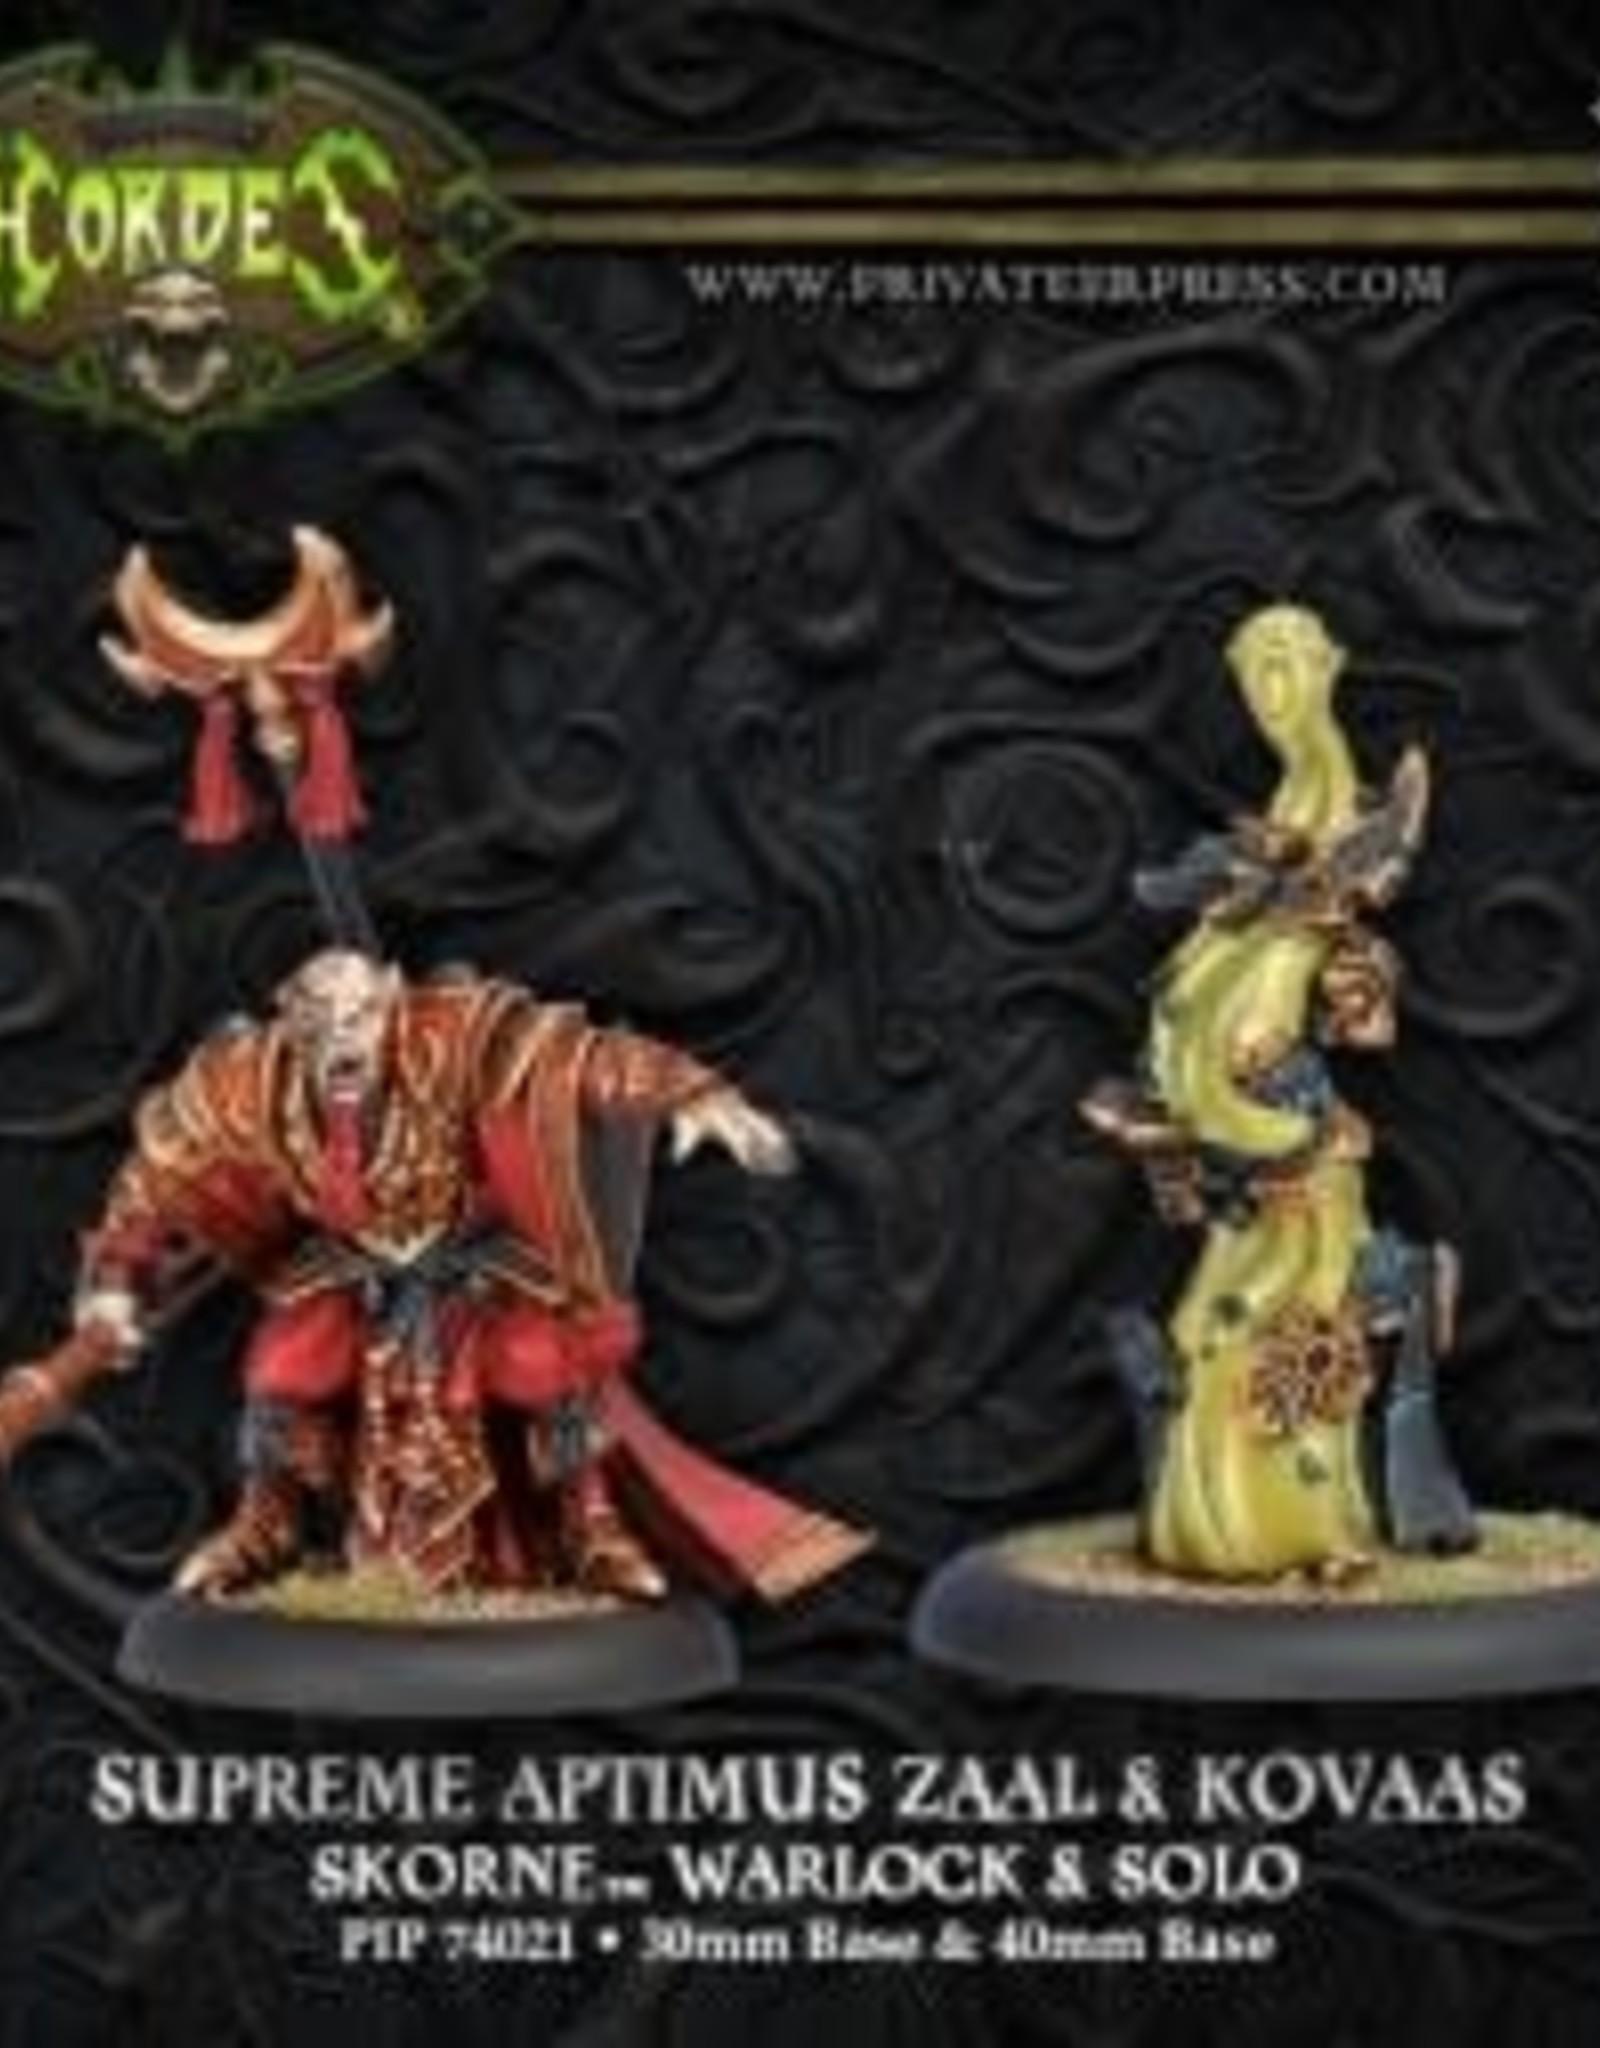 Hordes Skorne - Supreme Aptimus Zaal & Kovaas